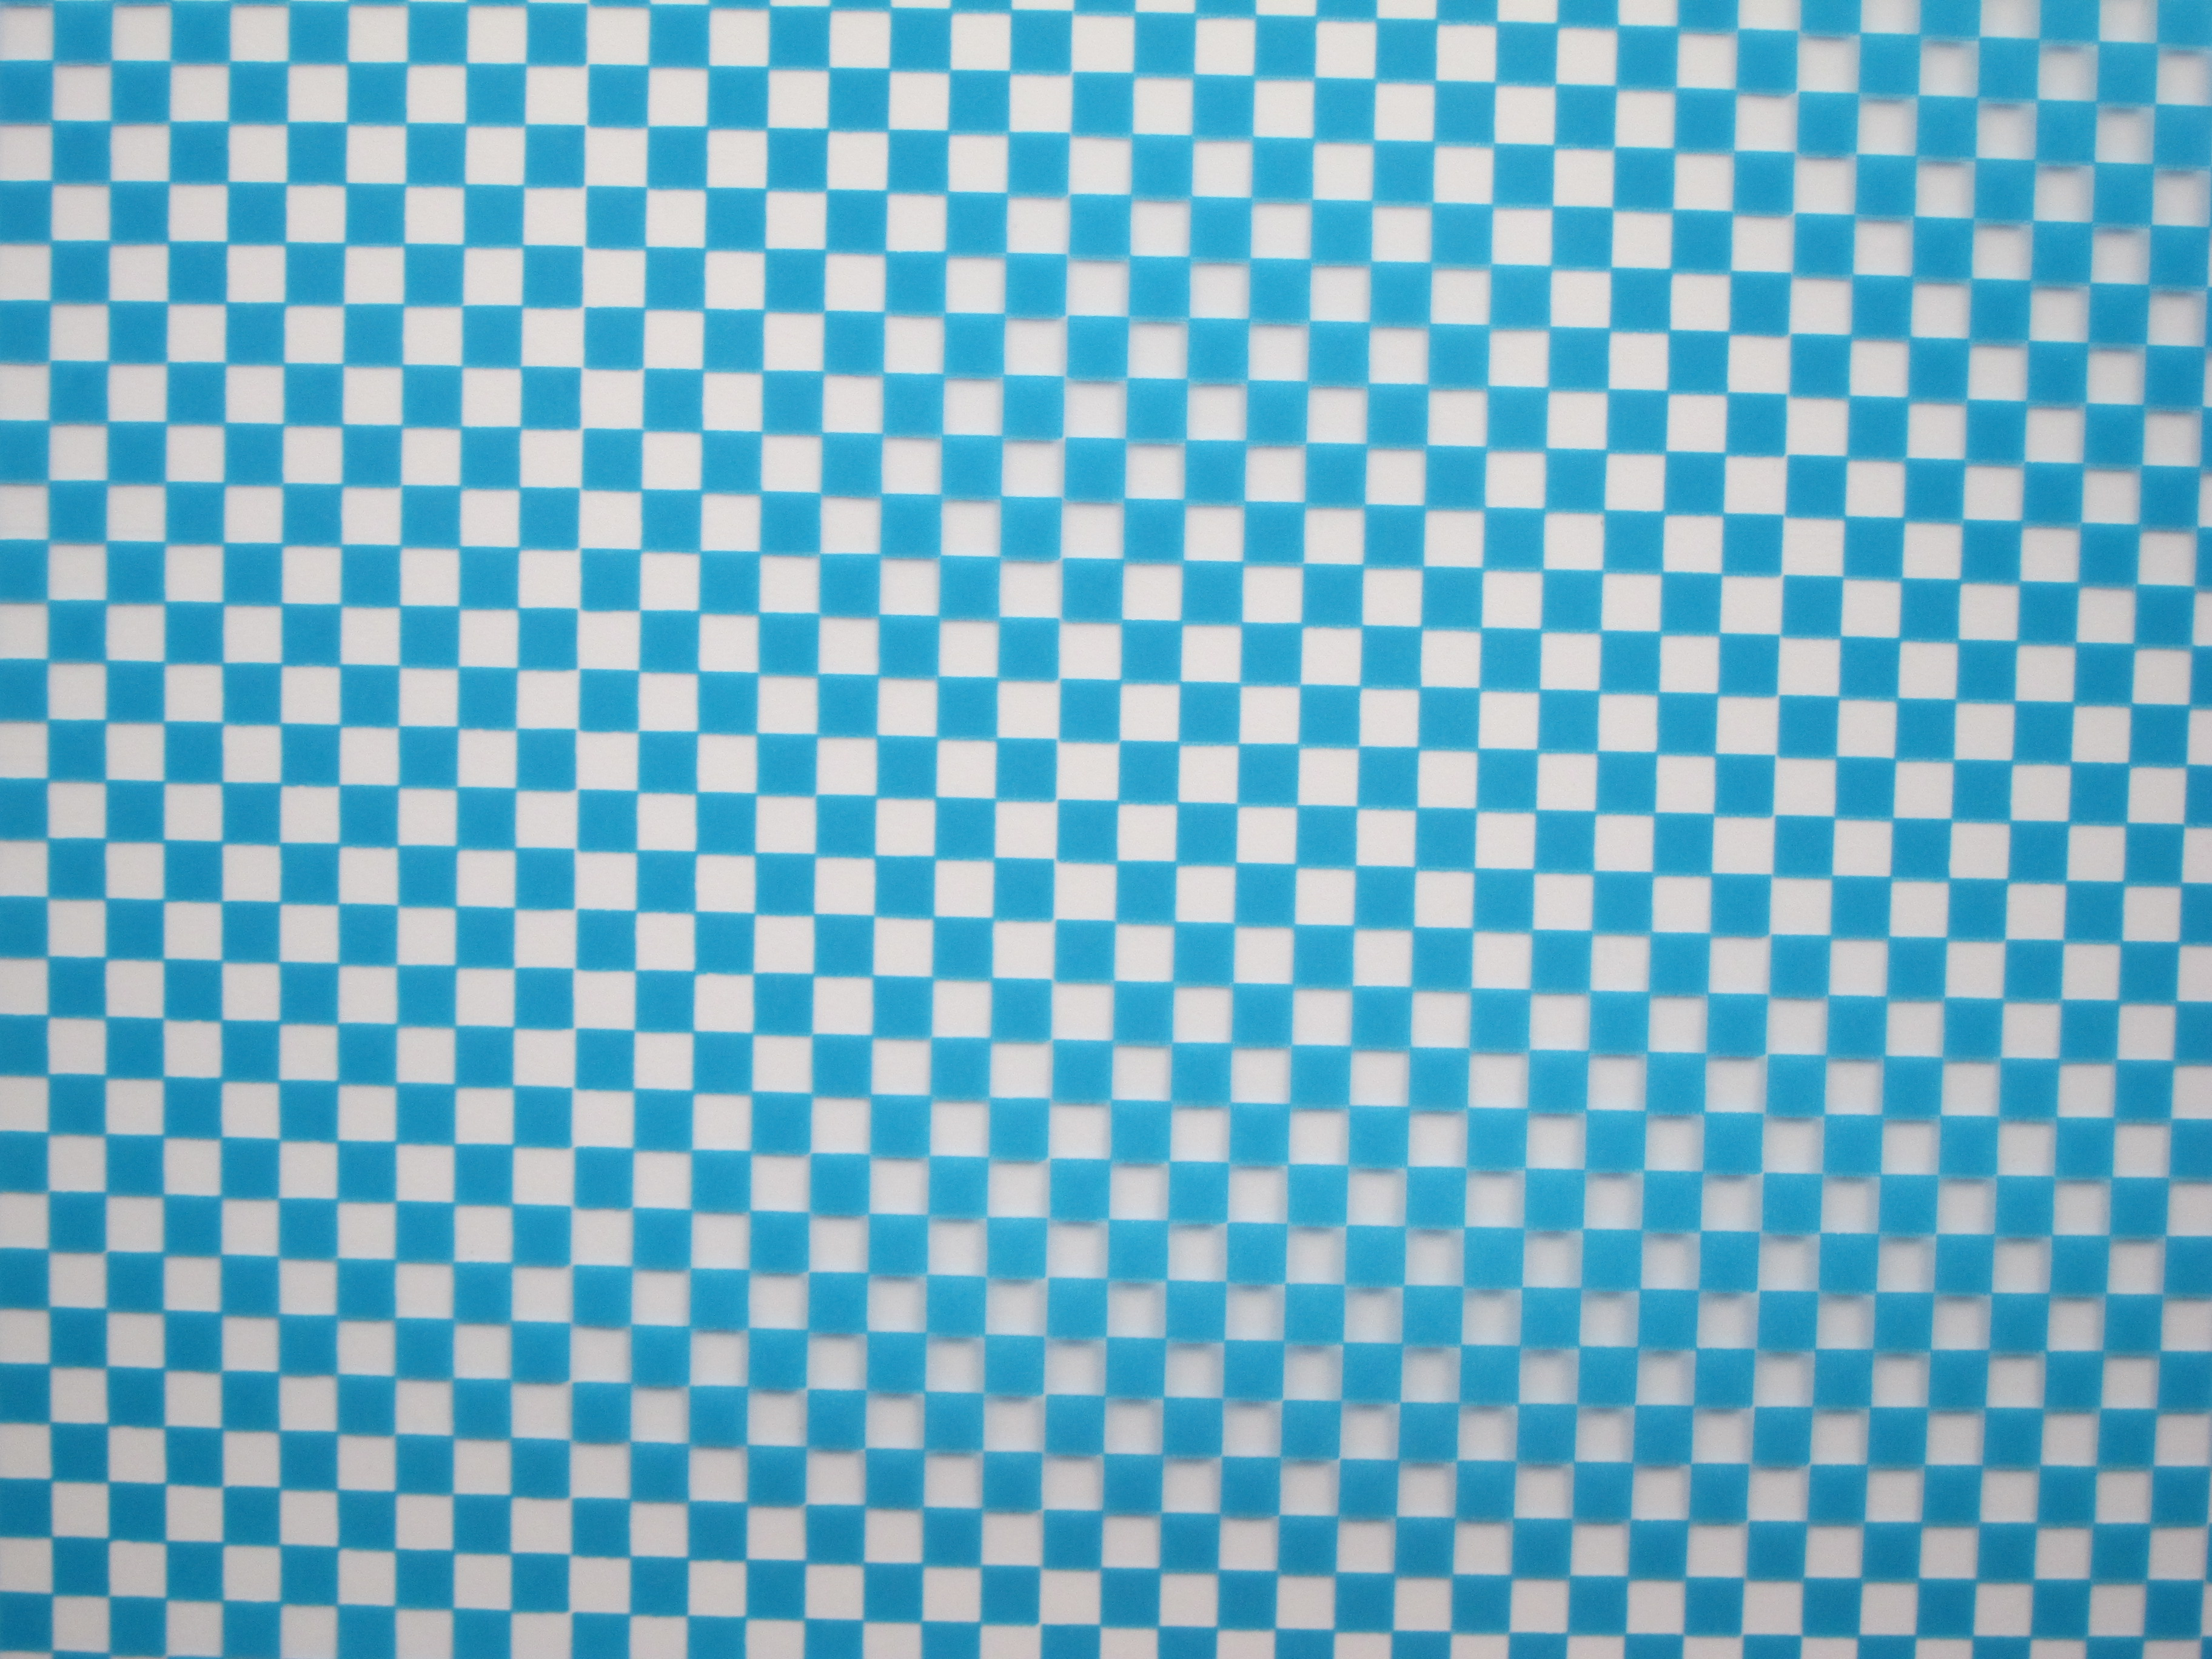 Light Blue Checkerboard